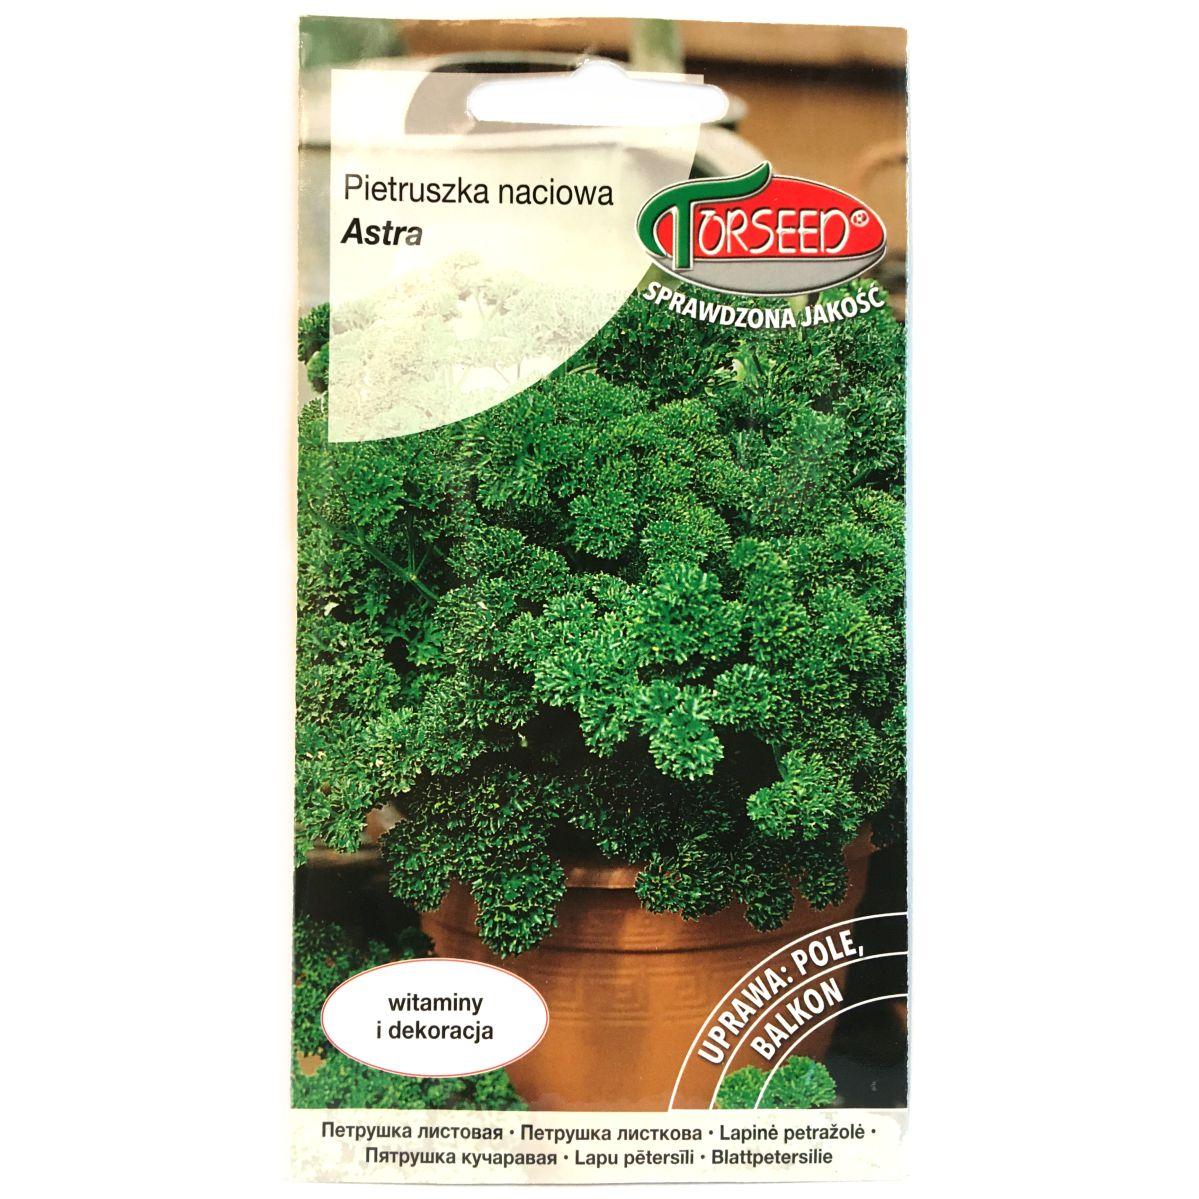 Pietruszka Astra nasiona Torseed